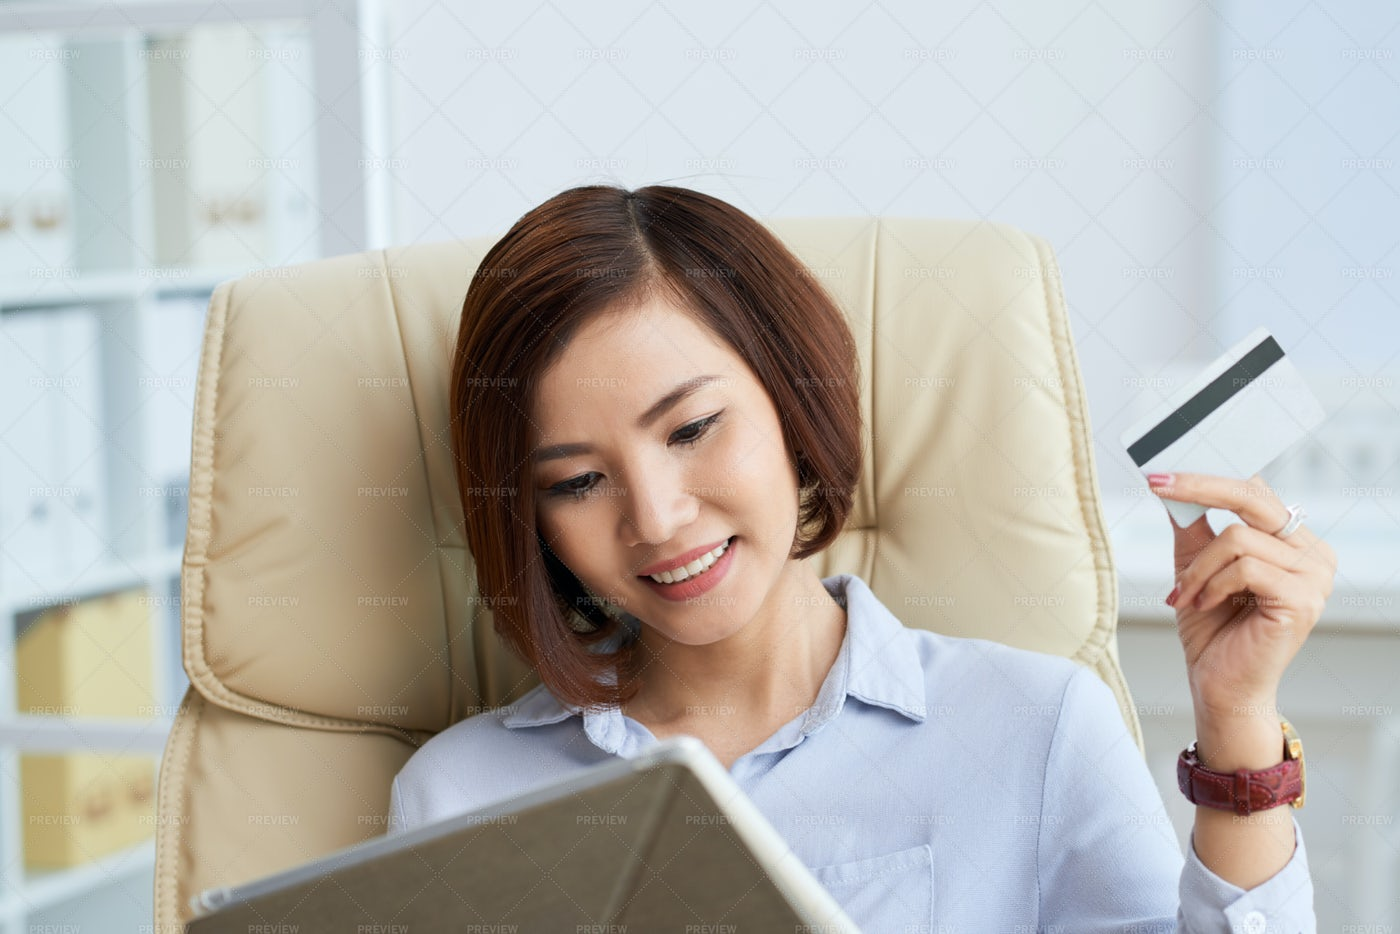 Paying Online: Stock Photos